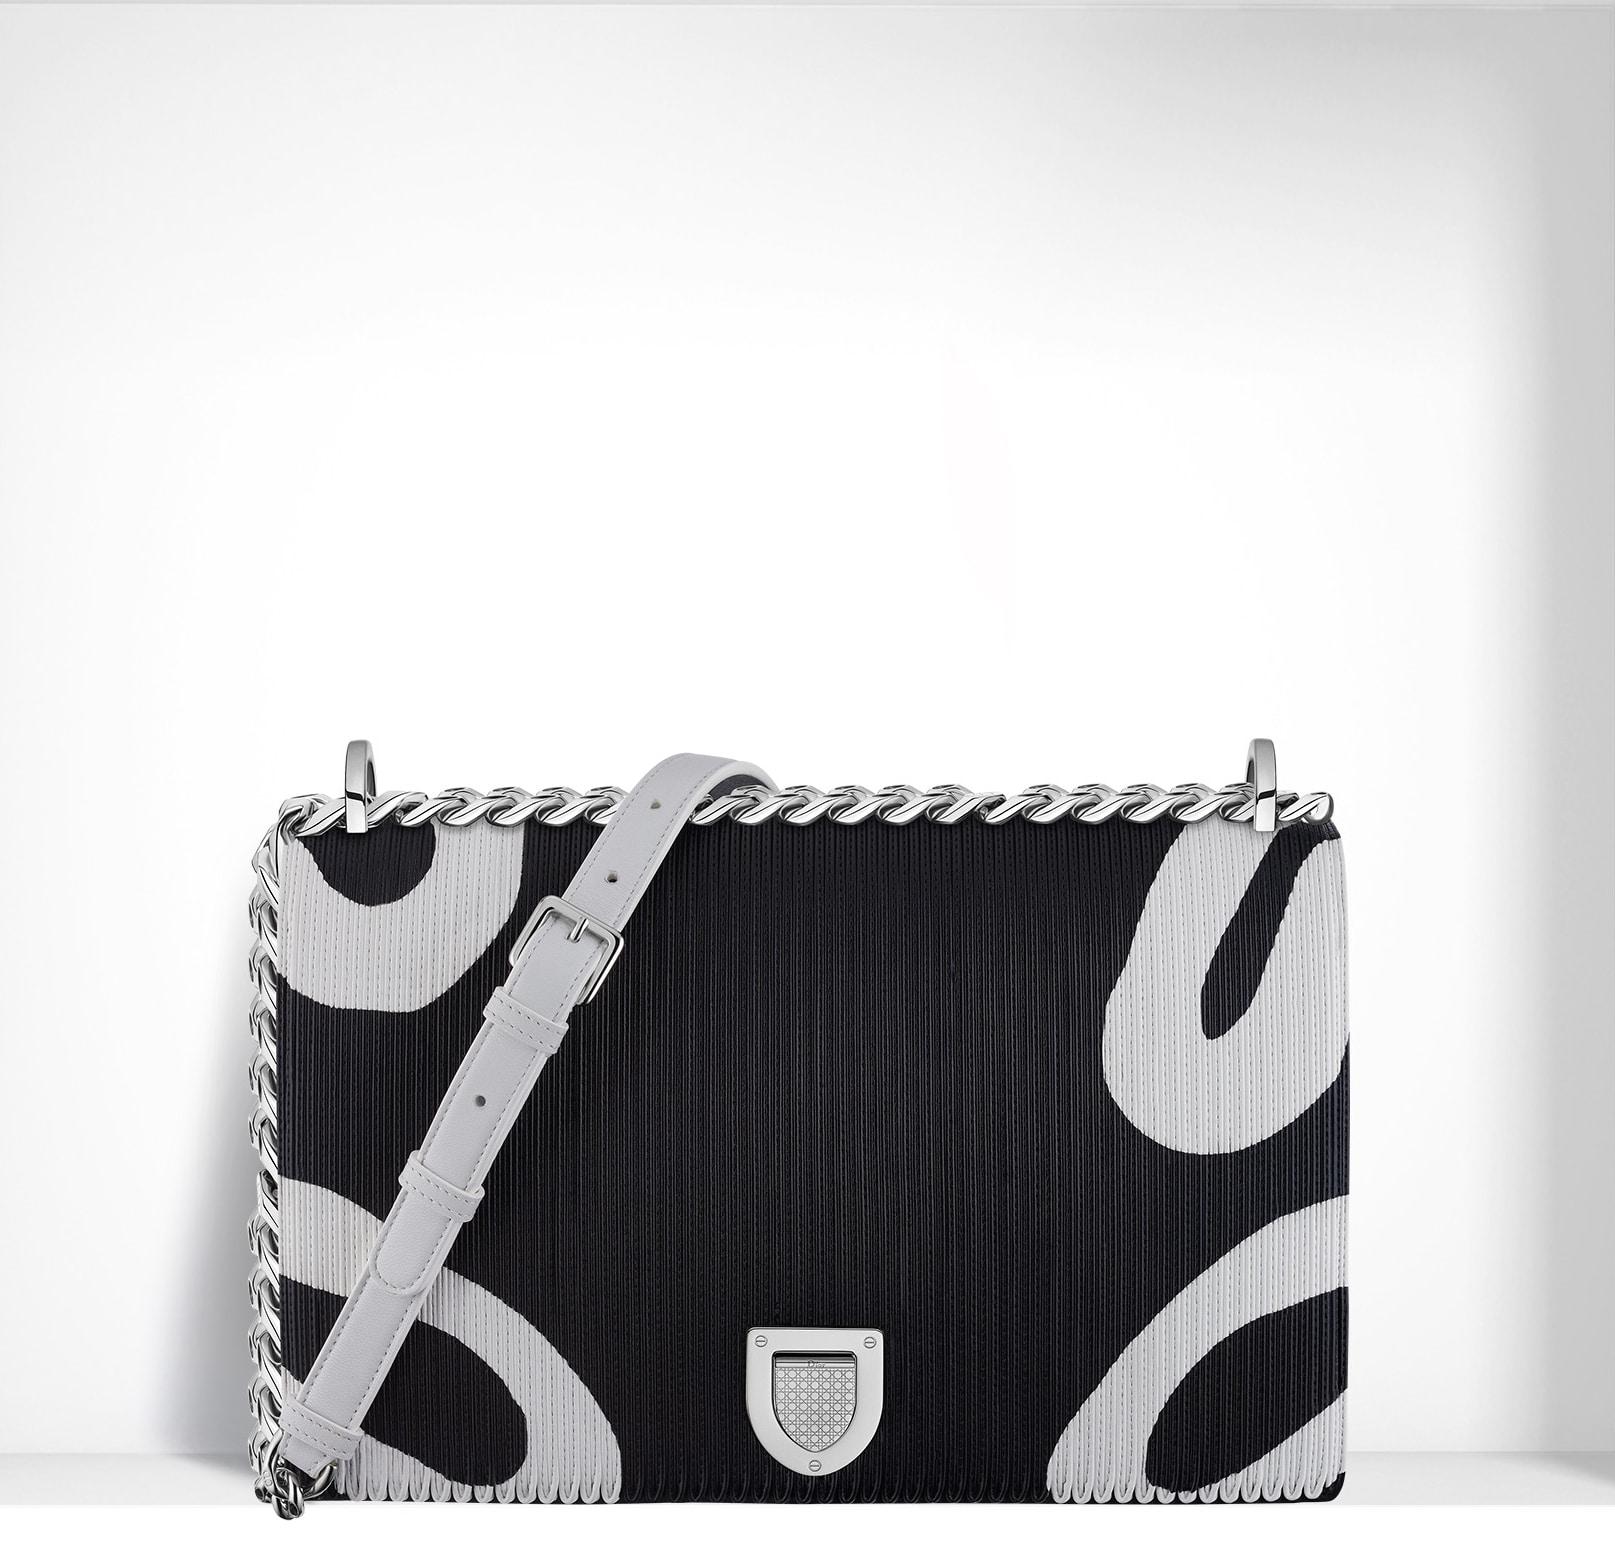 63d68b895de69 Dior Black White Animal Print Diorama Flap Large Bag